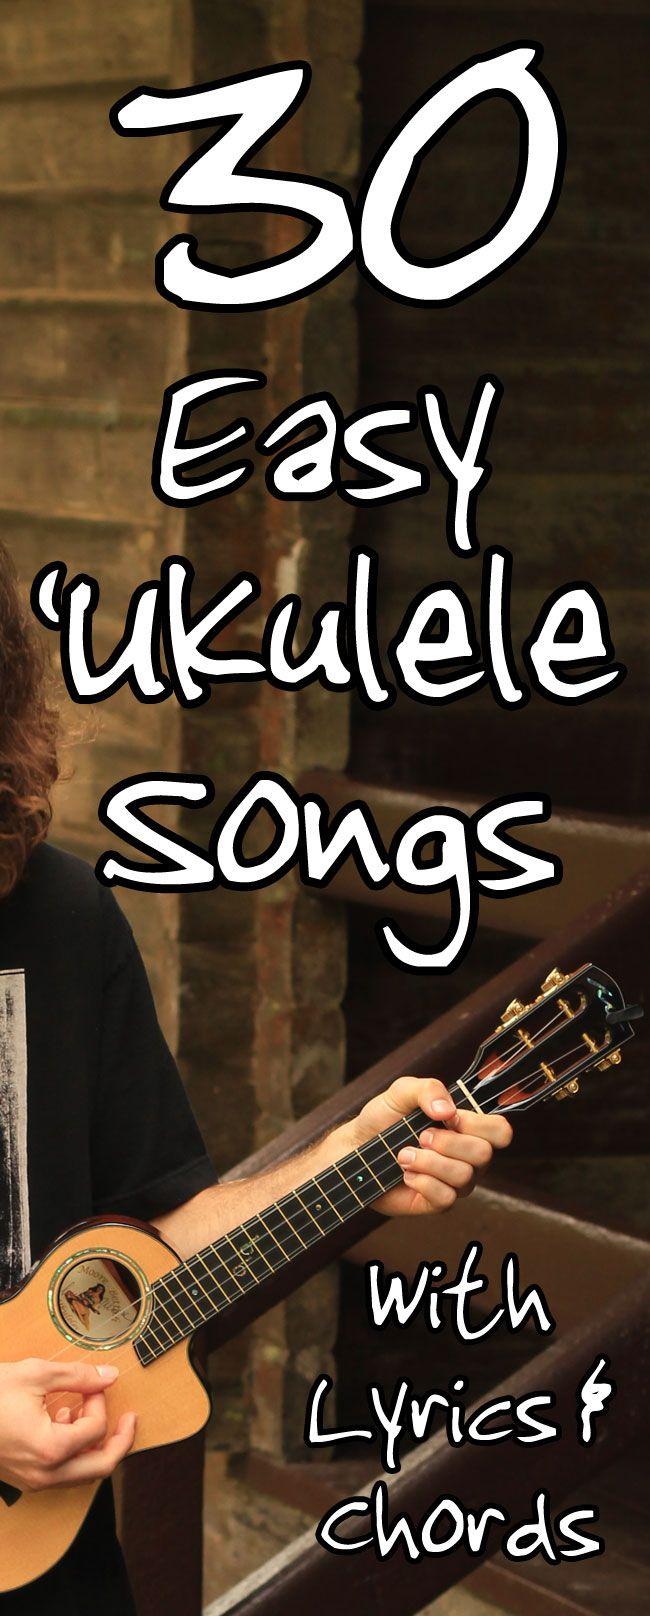 30 easy ukulele songs for beginners 3 or 4 chord songs with 30 easy ukulele songs for beginners 3 or 4 chord songs with lyrics hexwebz Choice Image